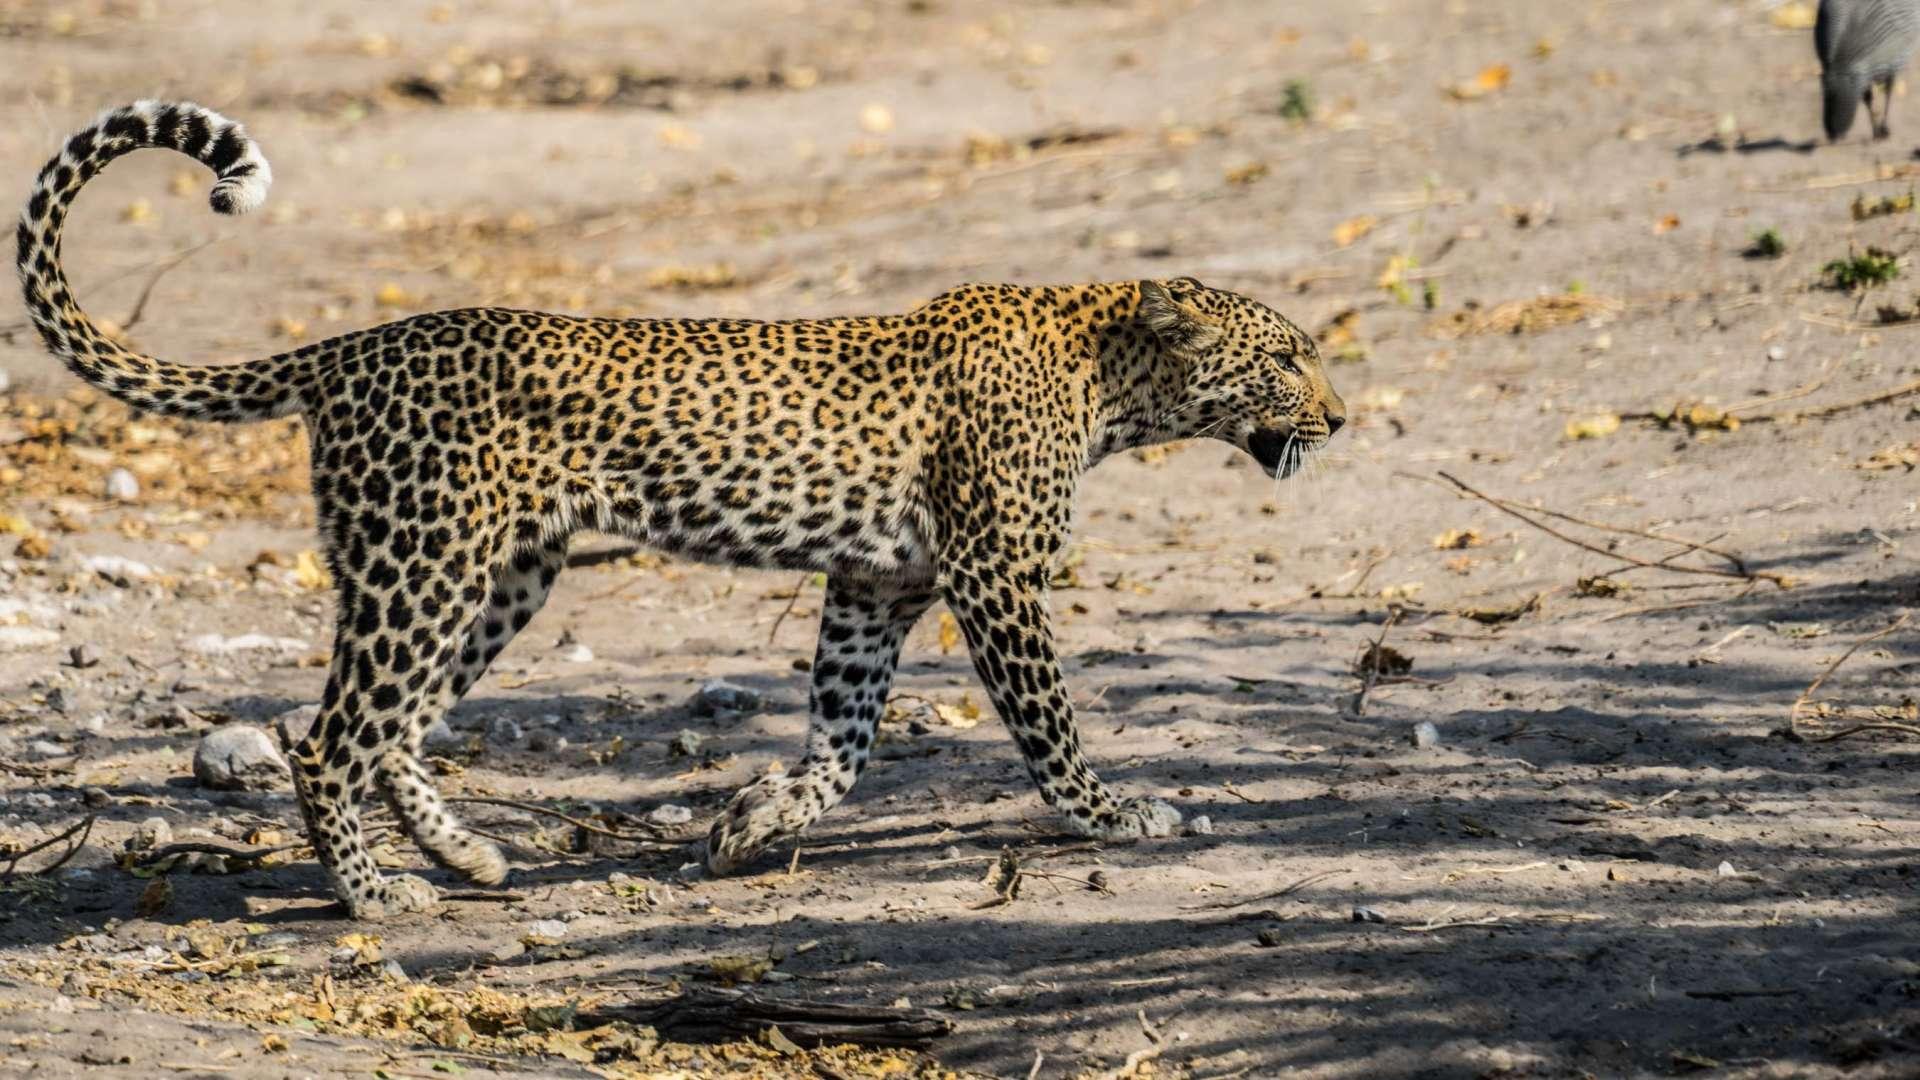 Victoria Falls Zimbawe Enrico Pescantini Chobe day trip leopard 2